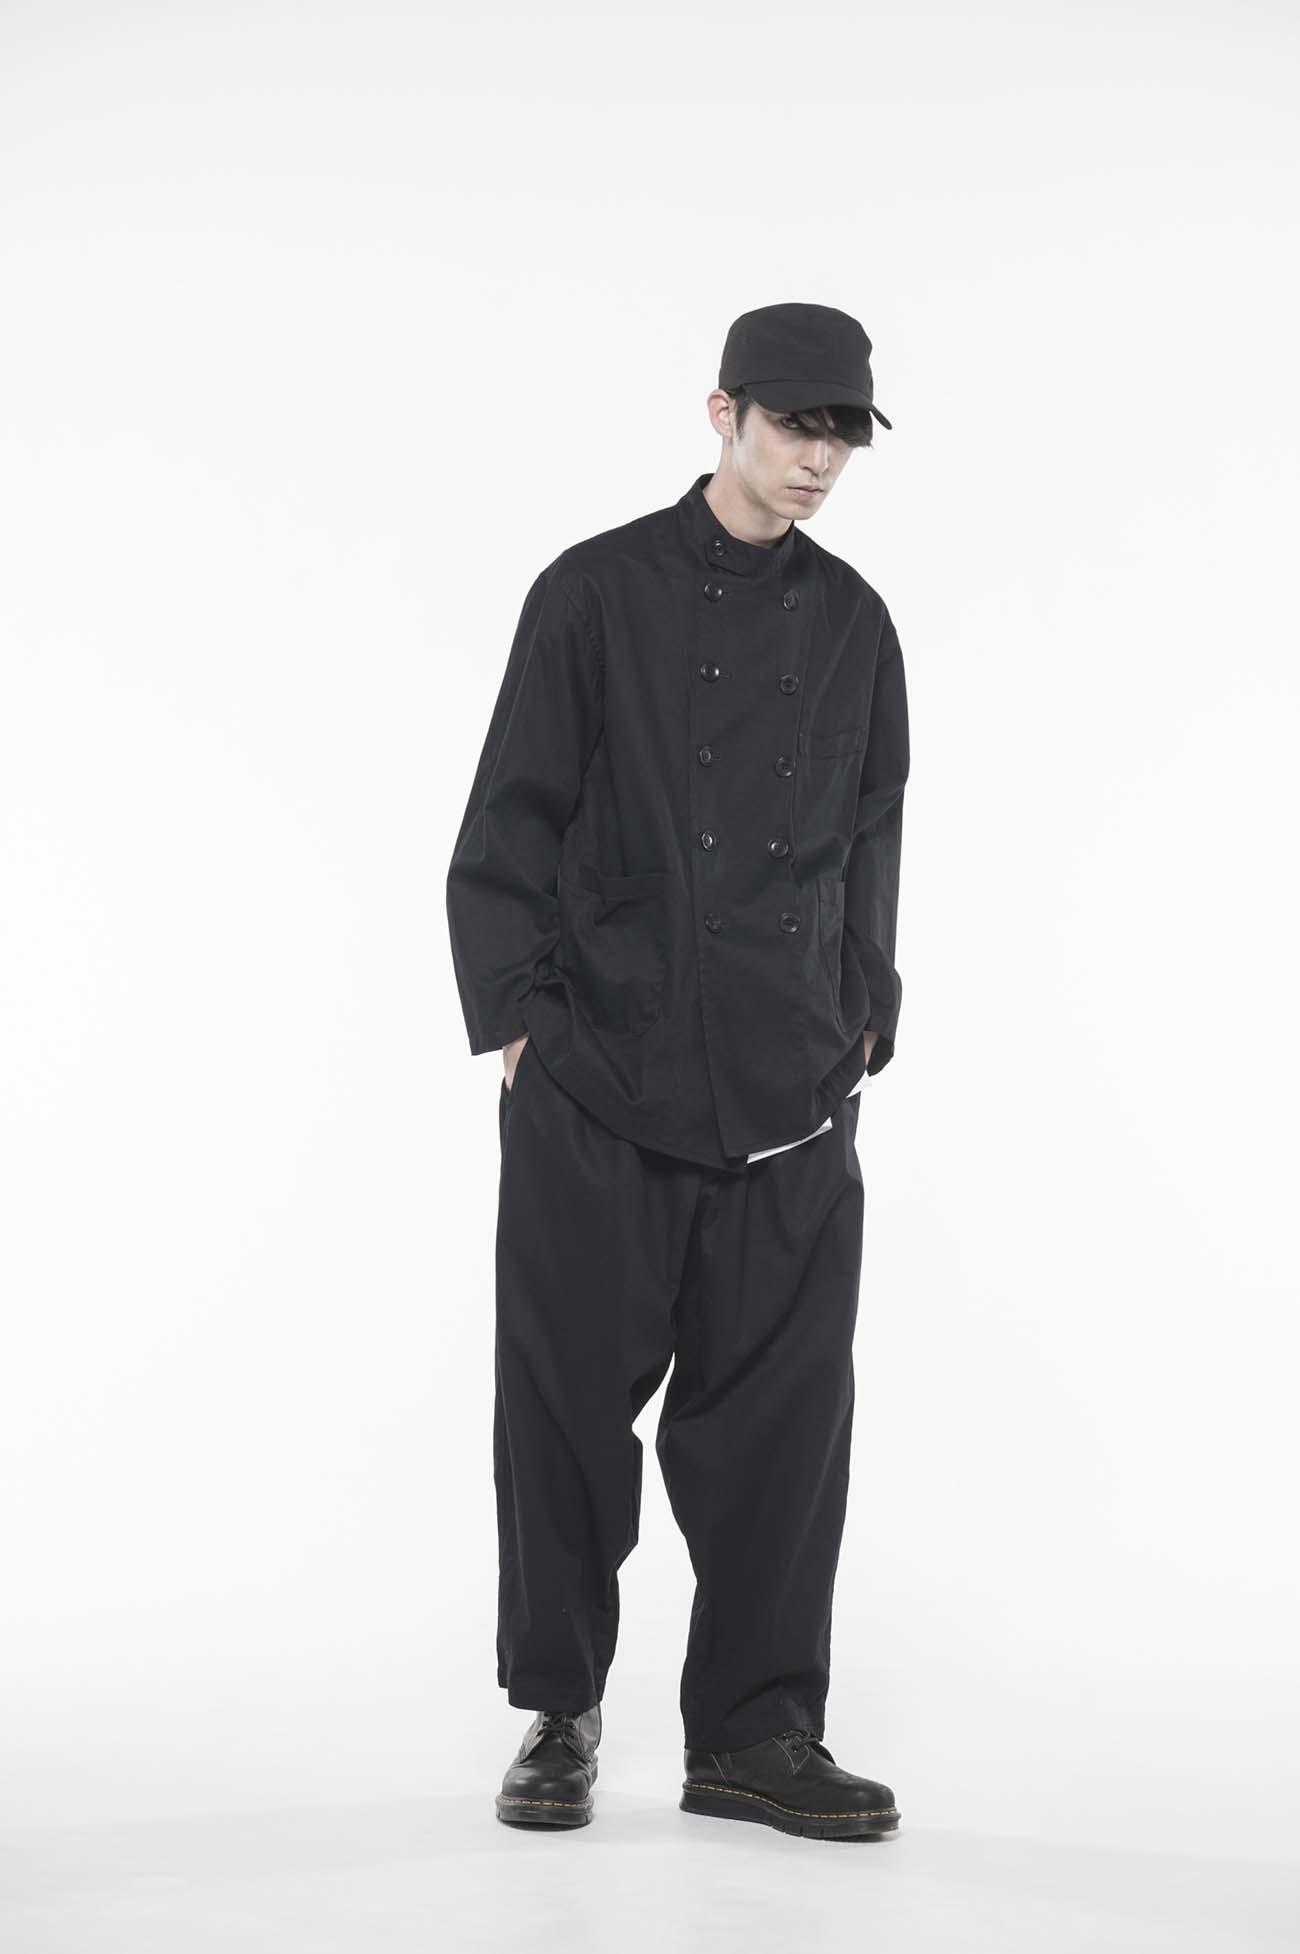 20/Cotton Twill Washer Cook Shirt Jacket